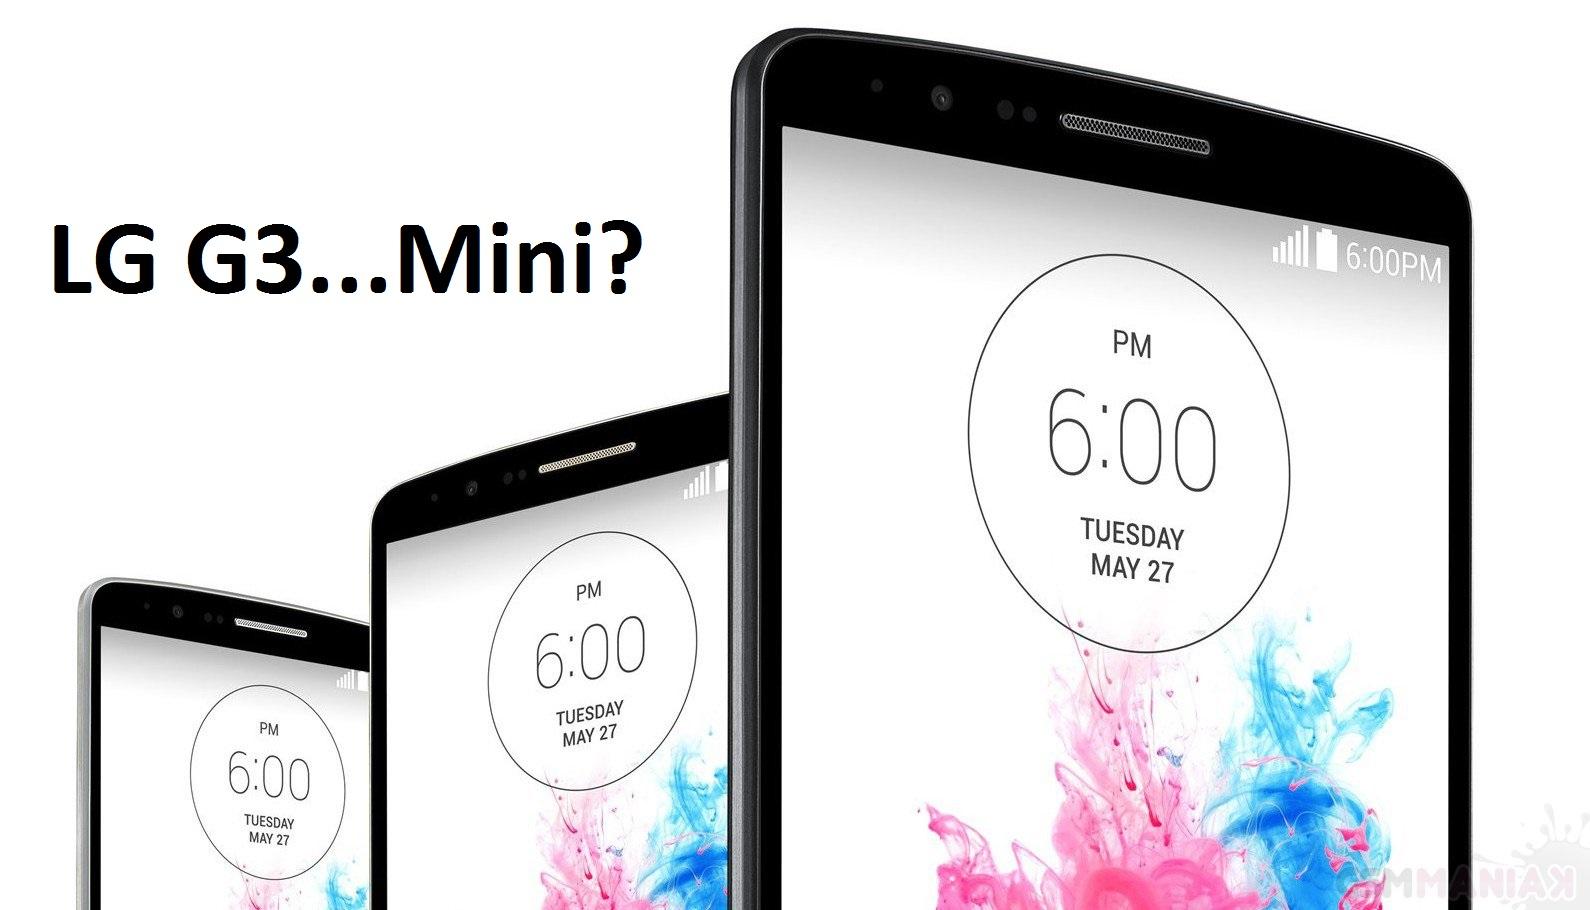 LG G3 Mini rumors